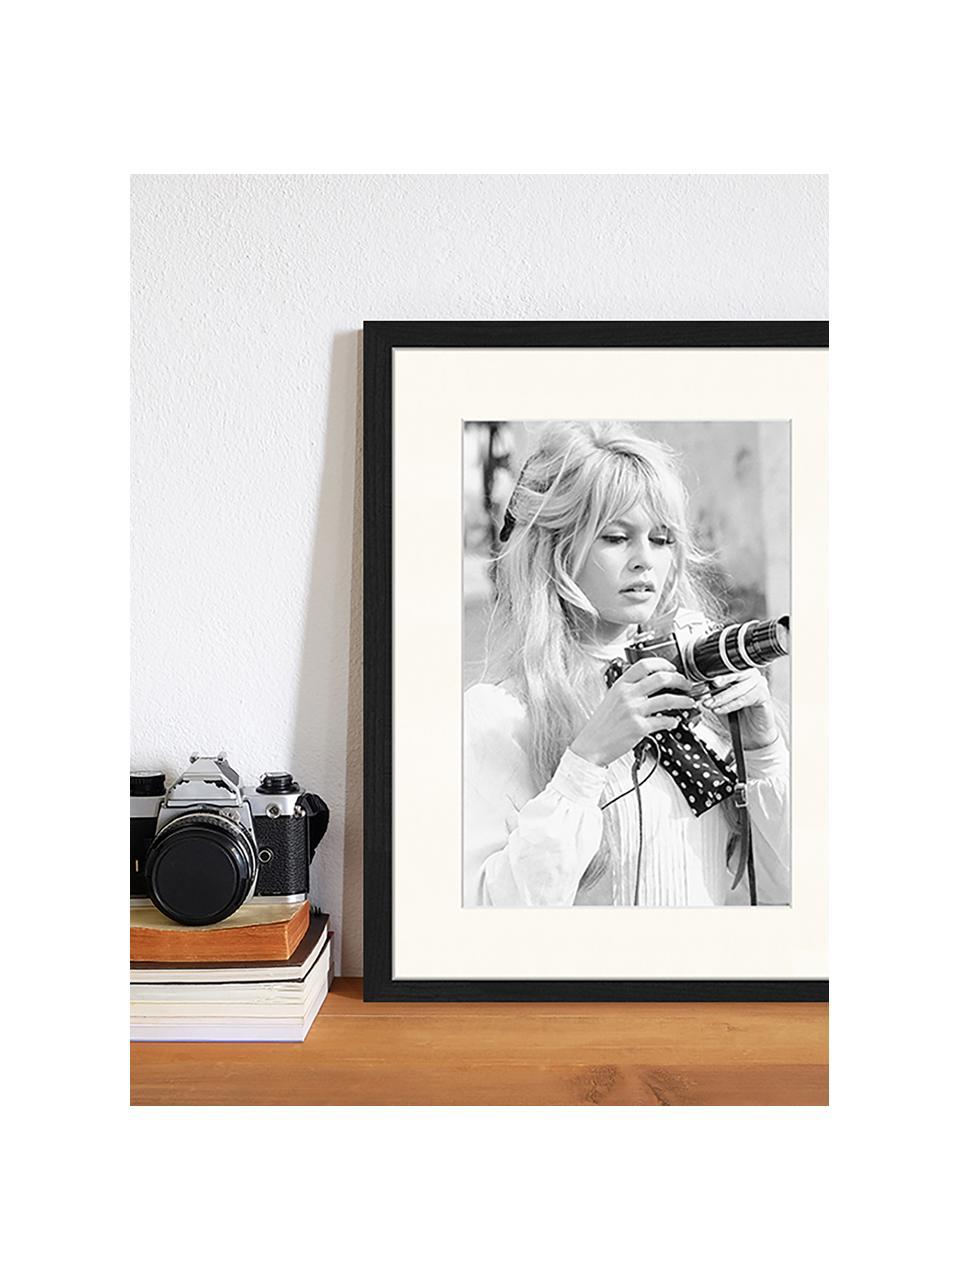 Ingelijste digitale print Brigitte With Her Camera, Afbeelding: digitale print op papier,, Lijst: gelakt hout, Zwart, wit, 33 x 43 cm